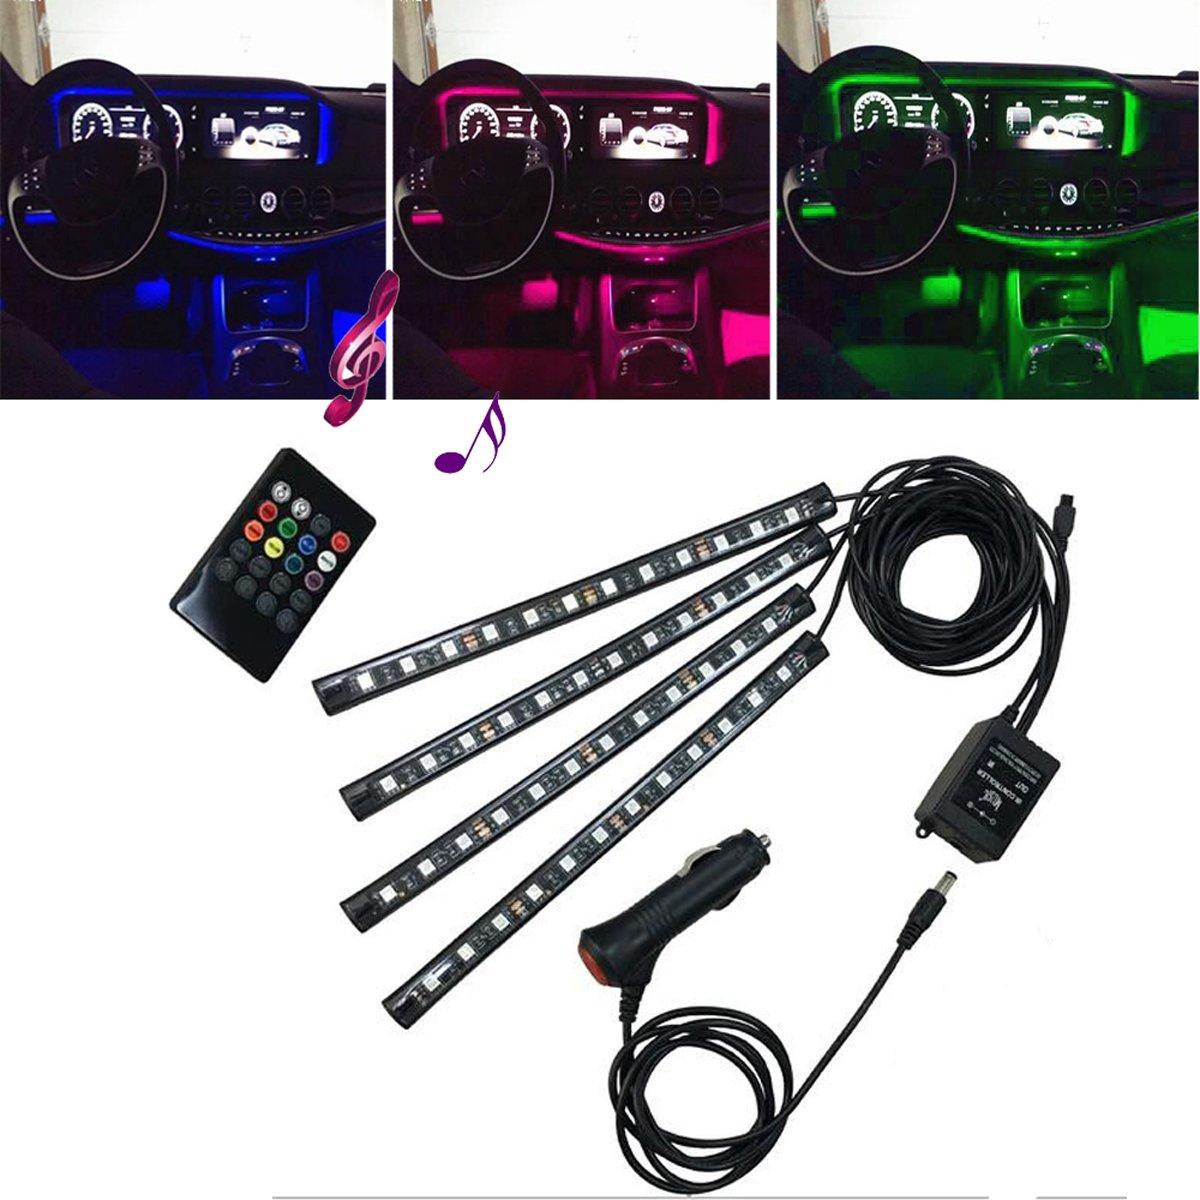 Lononvie Car Interior Lighting Kit Sound Sensor Light,4pcs 8 Color 48LED light,Strip Atmosphere Decorative for Car With Music Sound Active Function and IR Remote Control